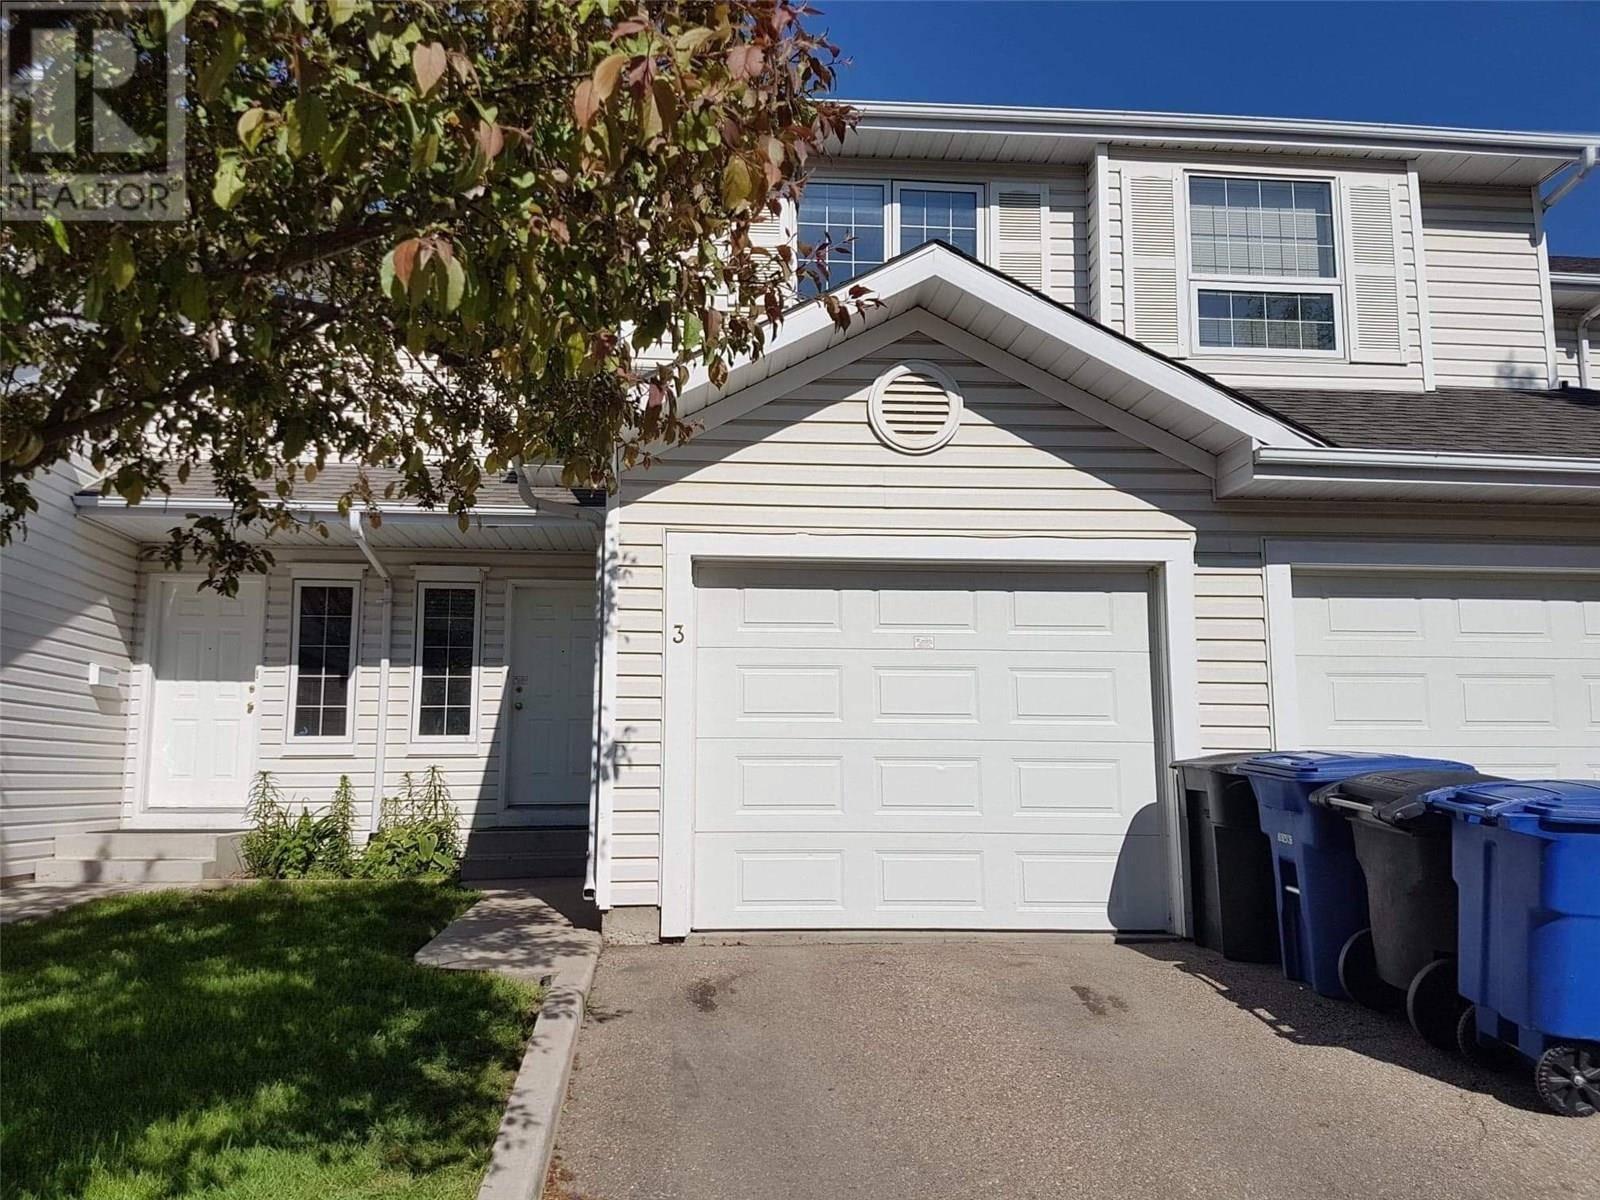 Townhouse for sale at 110 Keevil Cres Unit 3 Saskatoon Saskatchewan - MLS: SK779368